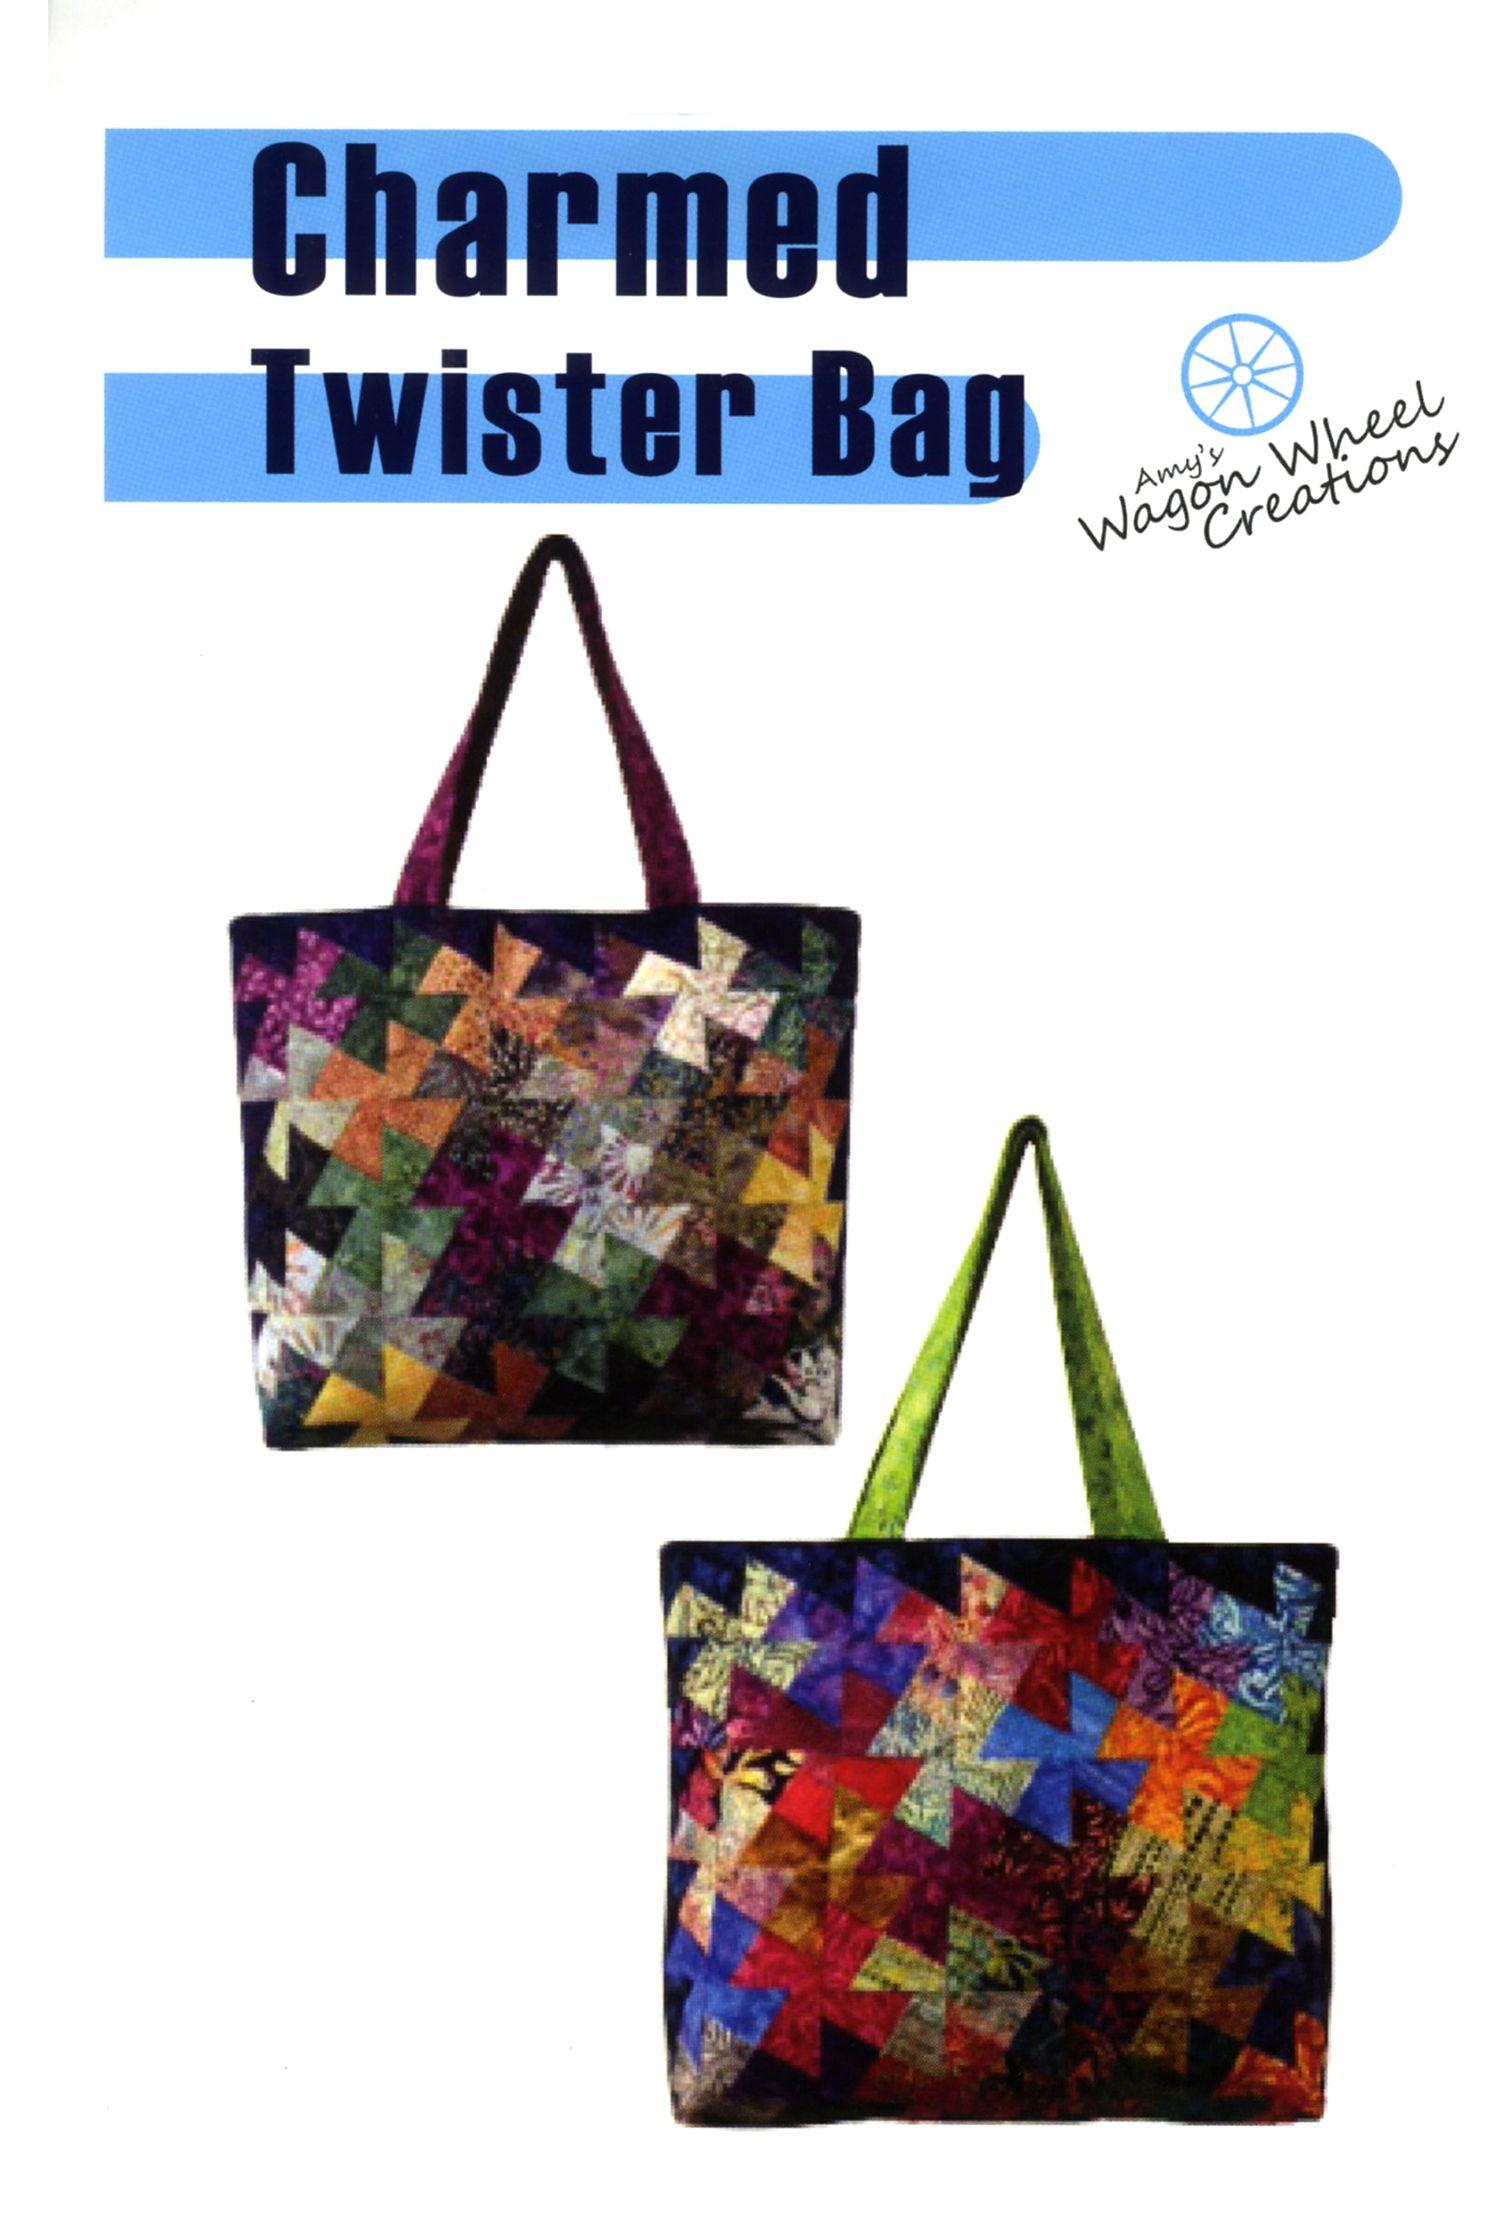 Charmed Twister Bag